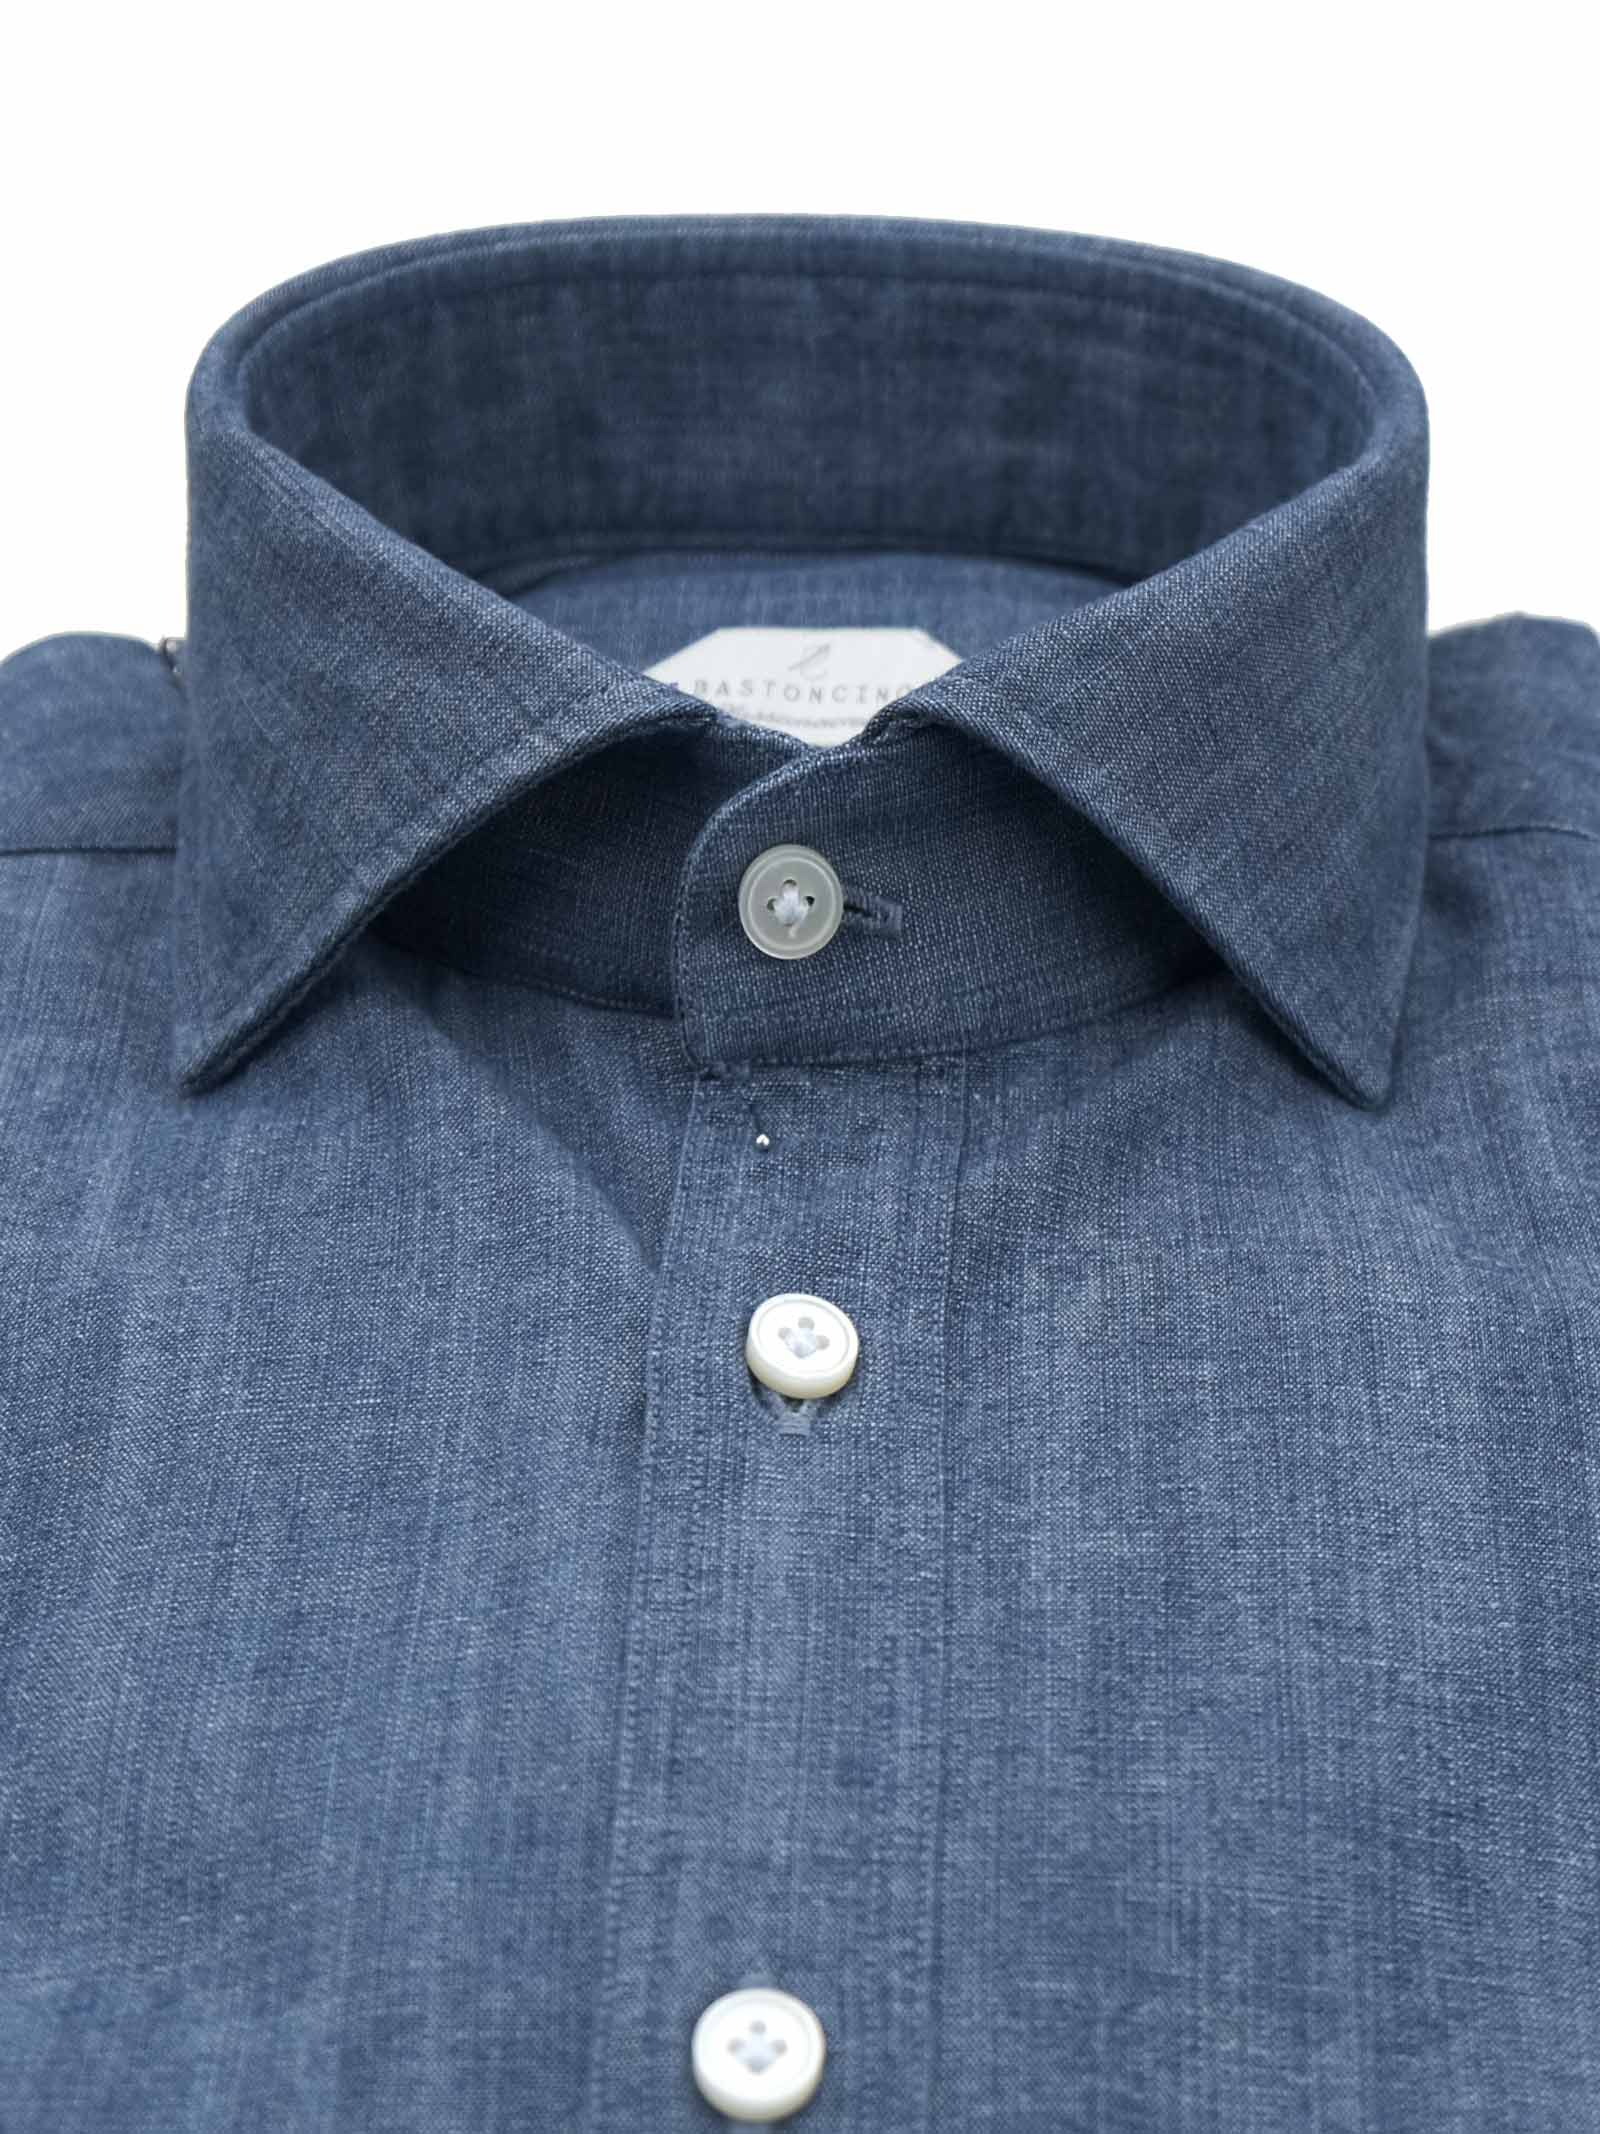 Printed shirt , regular fit , soft collar washed and softened BASTONCINO | Shirts | SARTC101 00